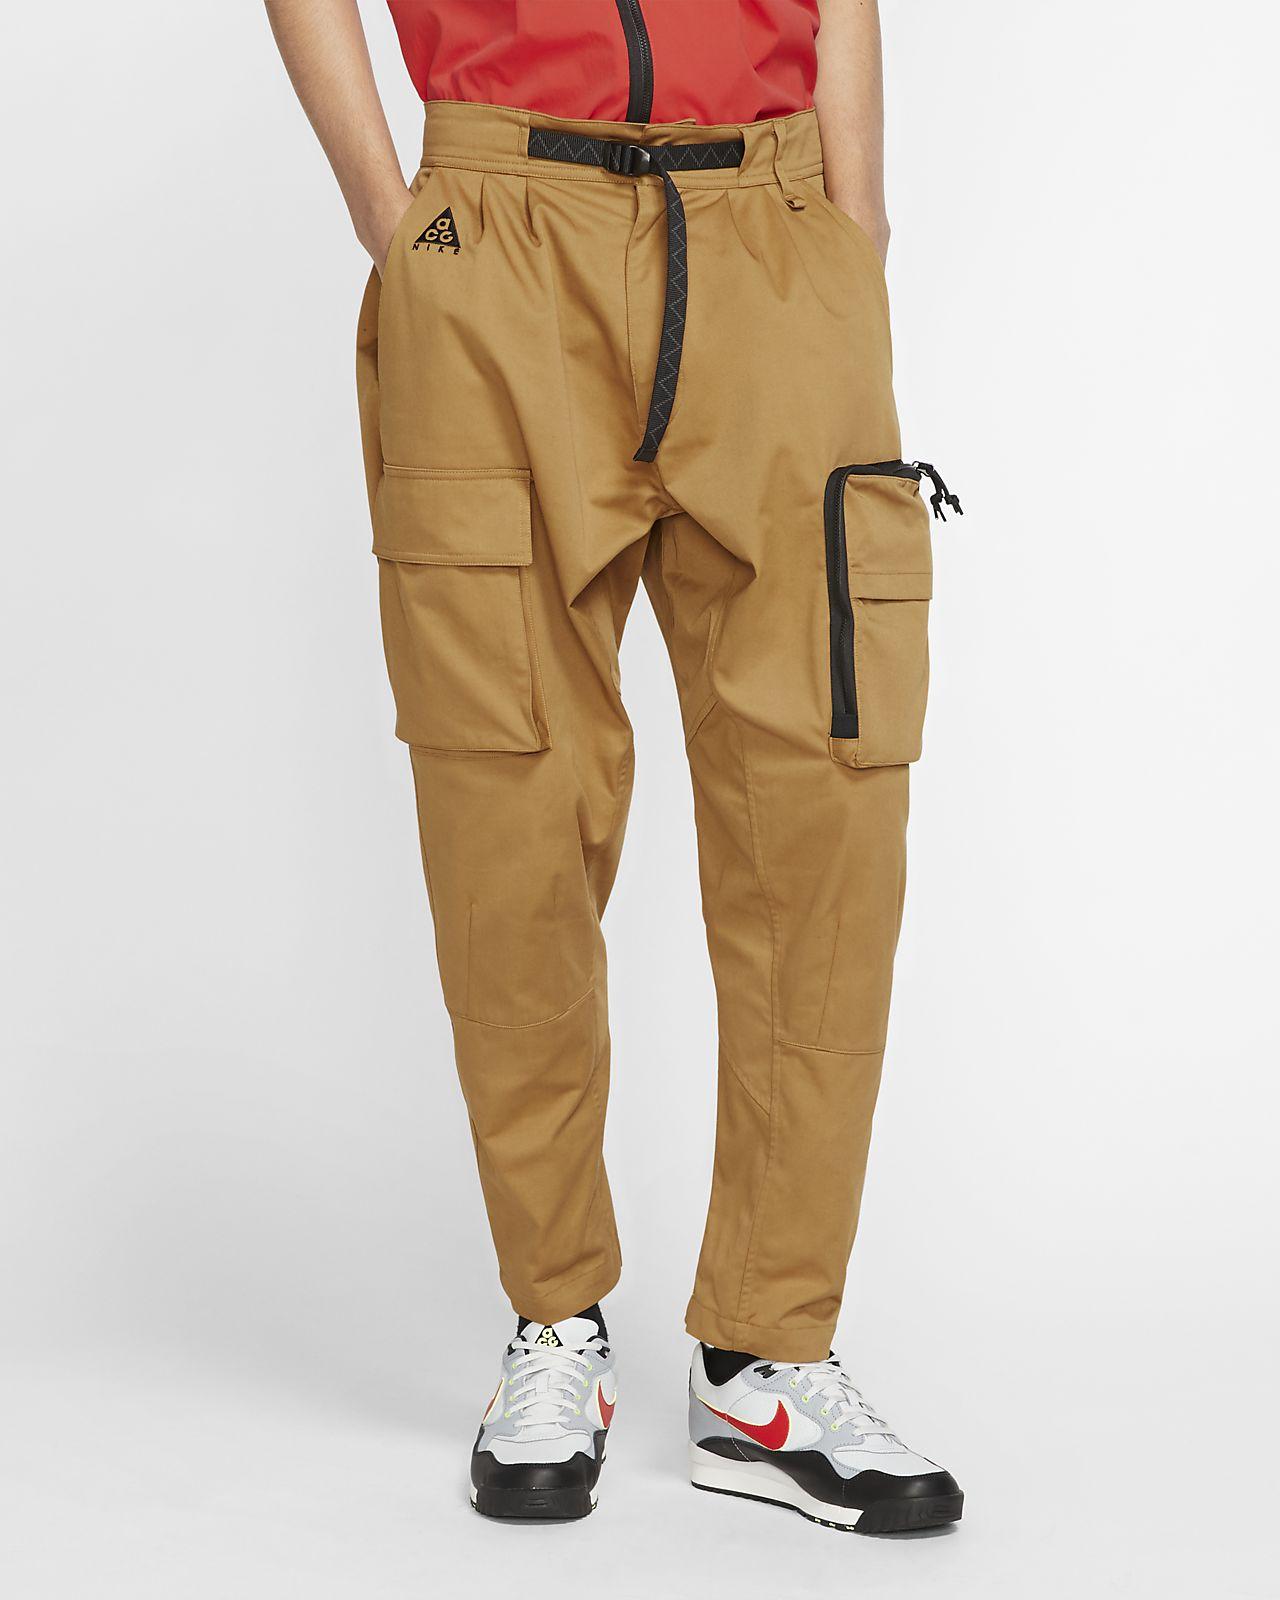 Pánské tkané cargo kalhoty Nike ACG